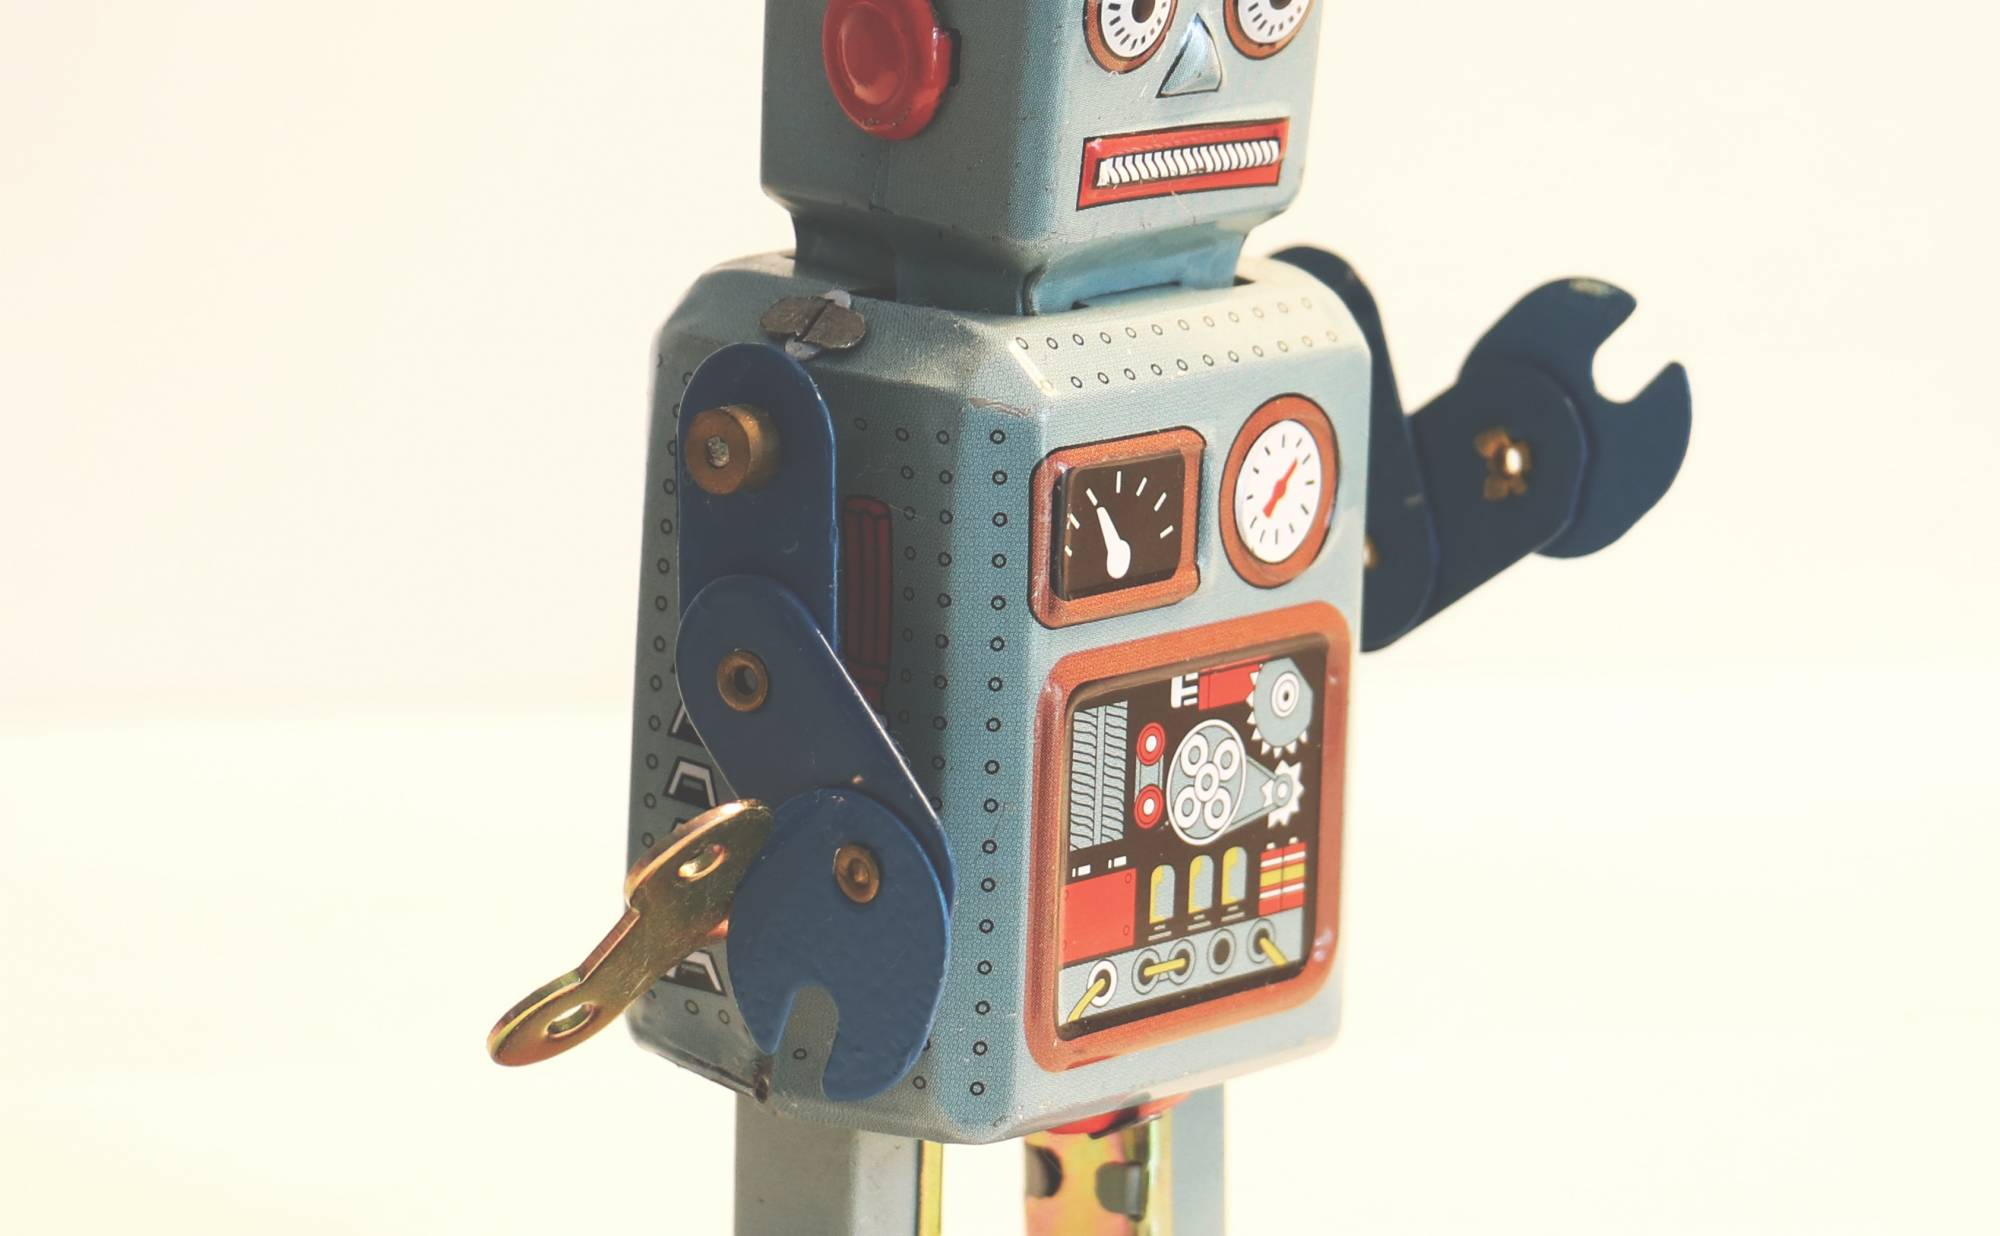 Robot standing